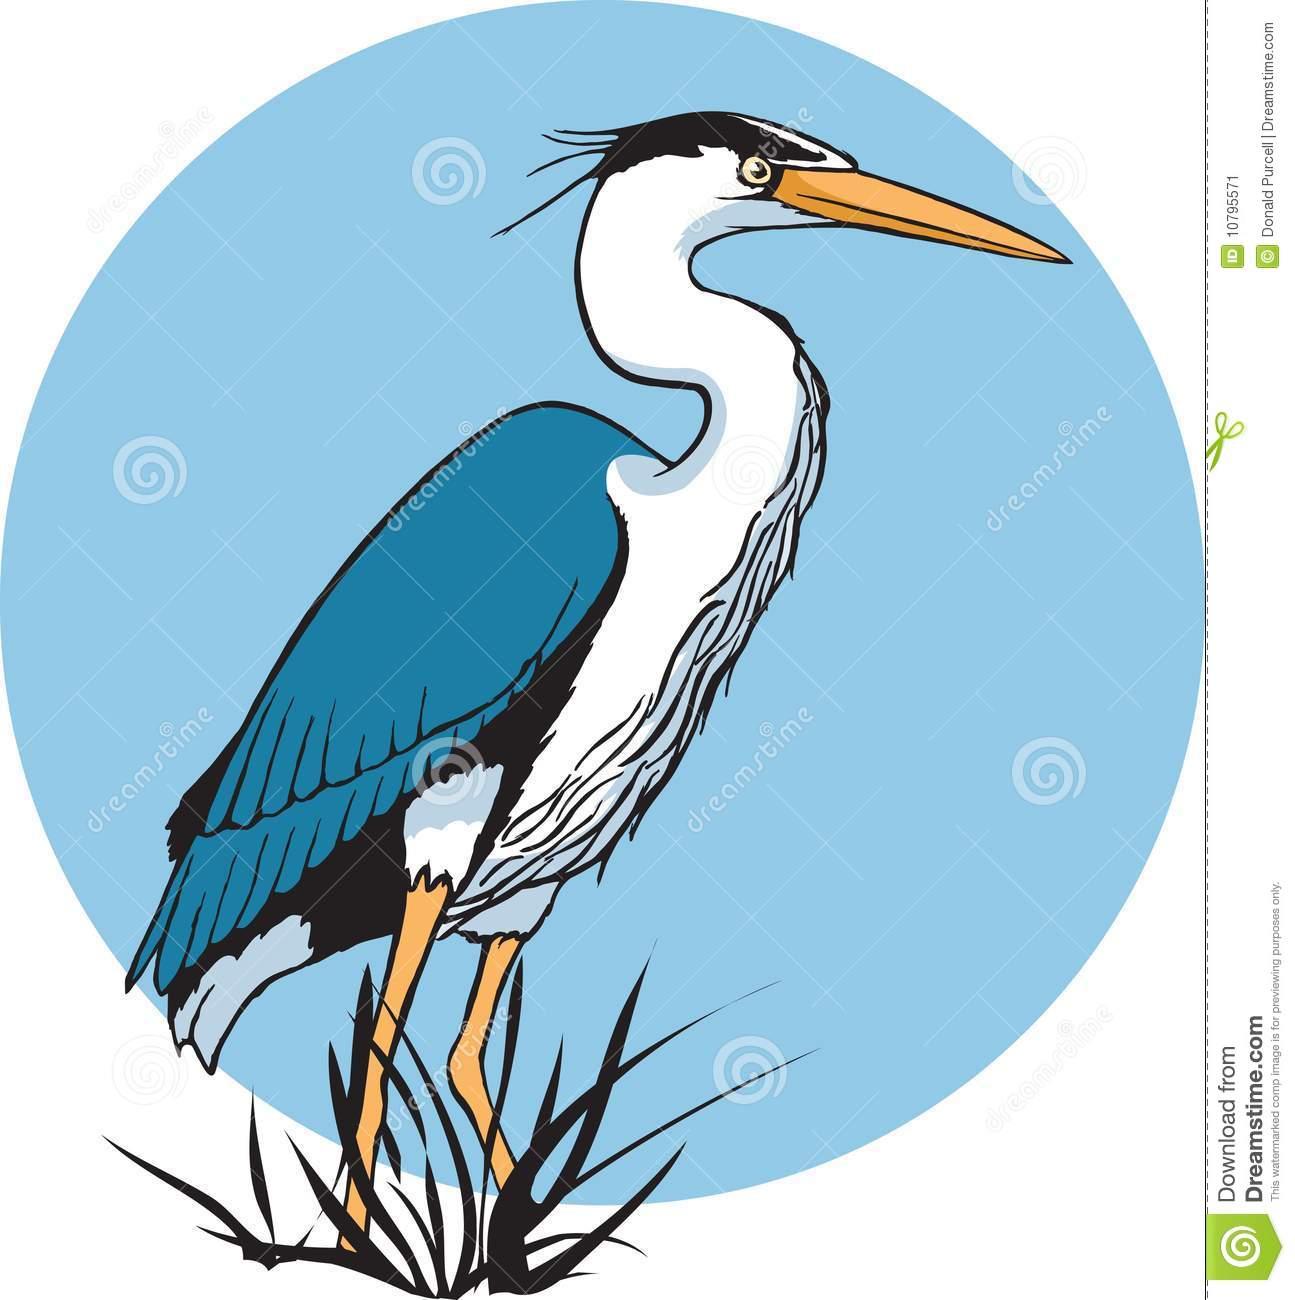 Heron Stock Image-Heron Stock Image-5